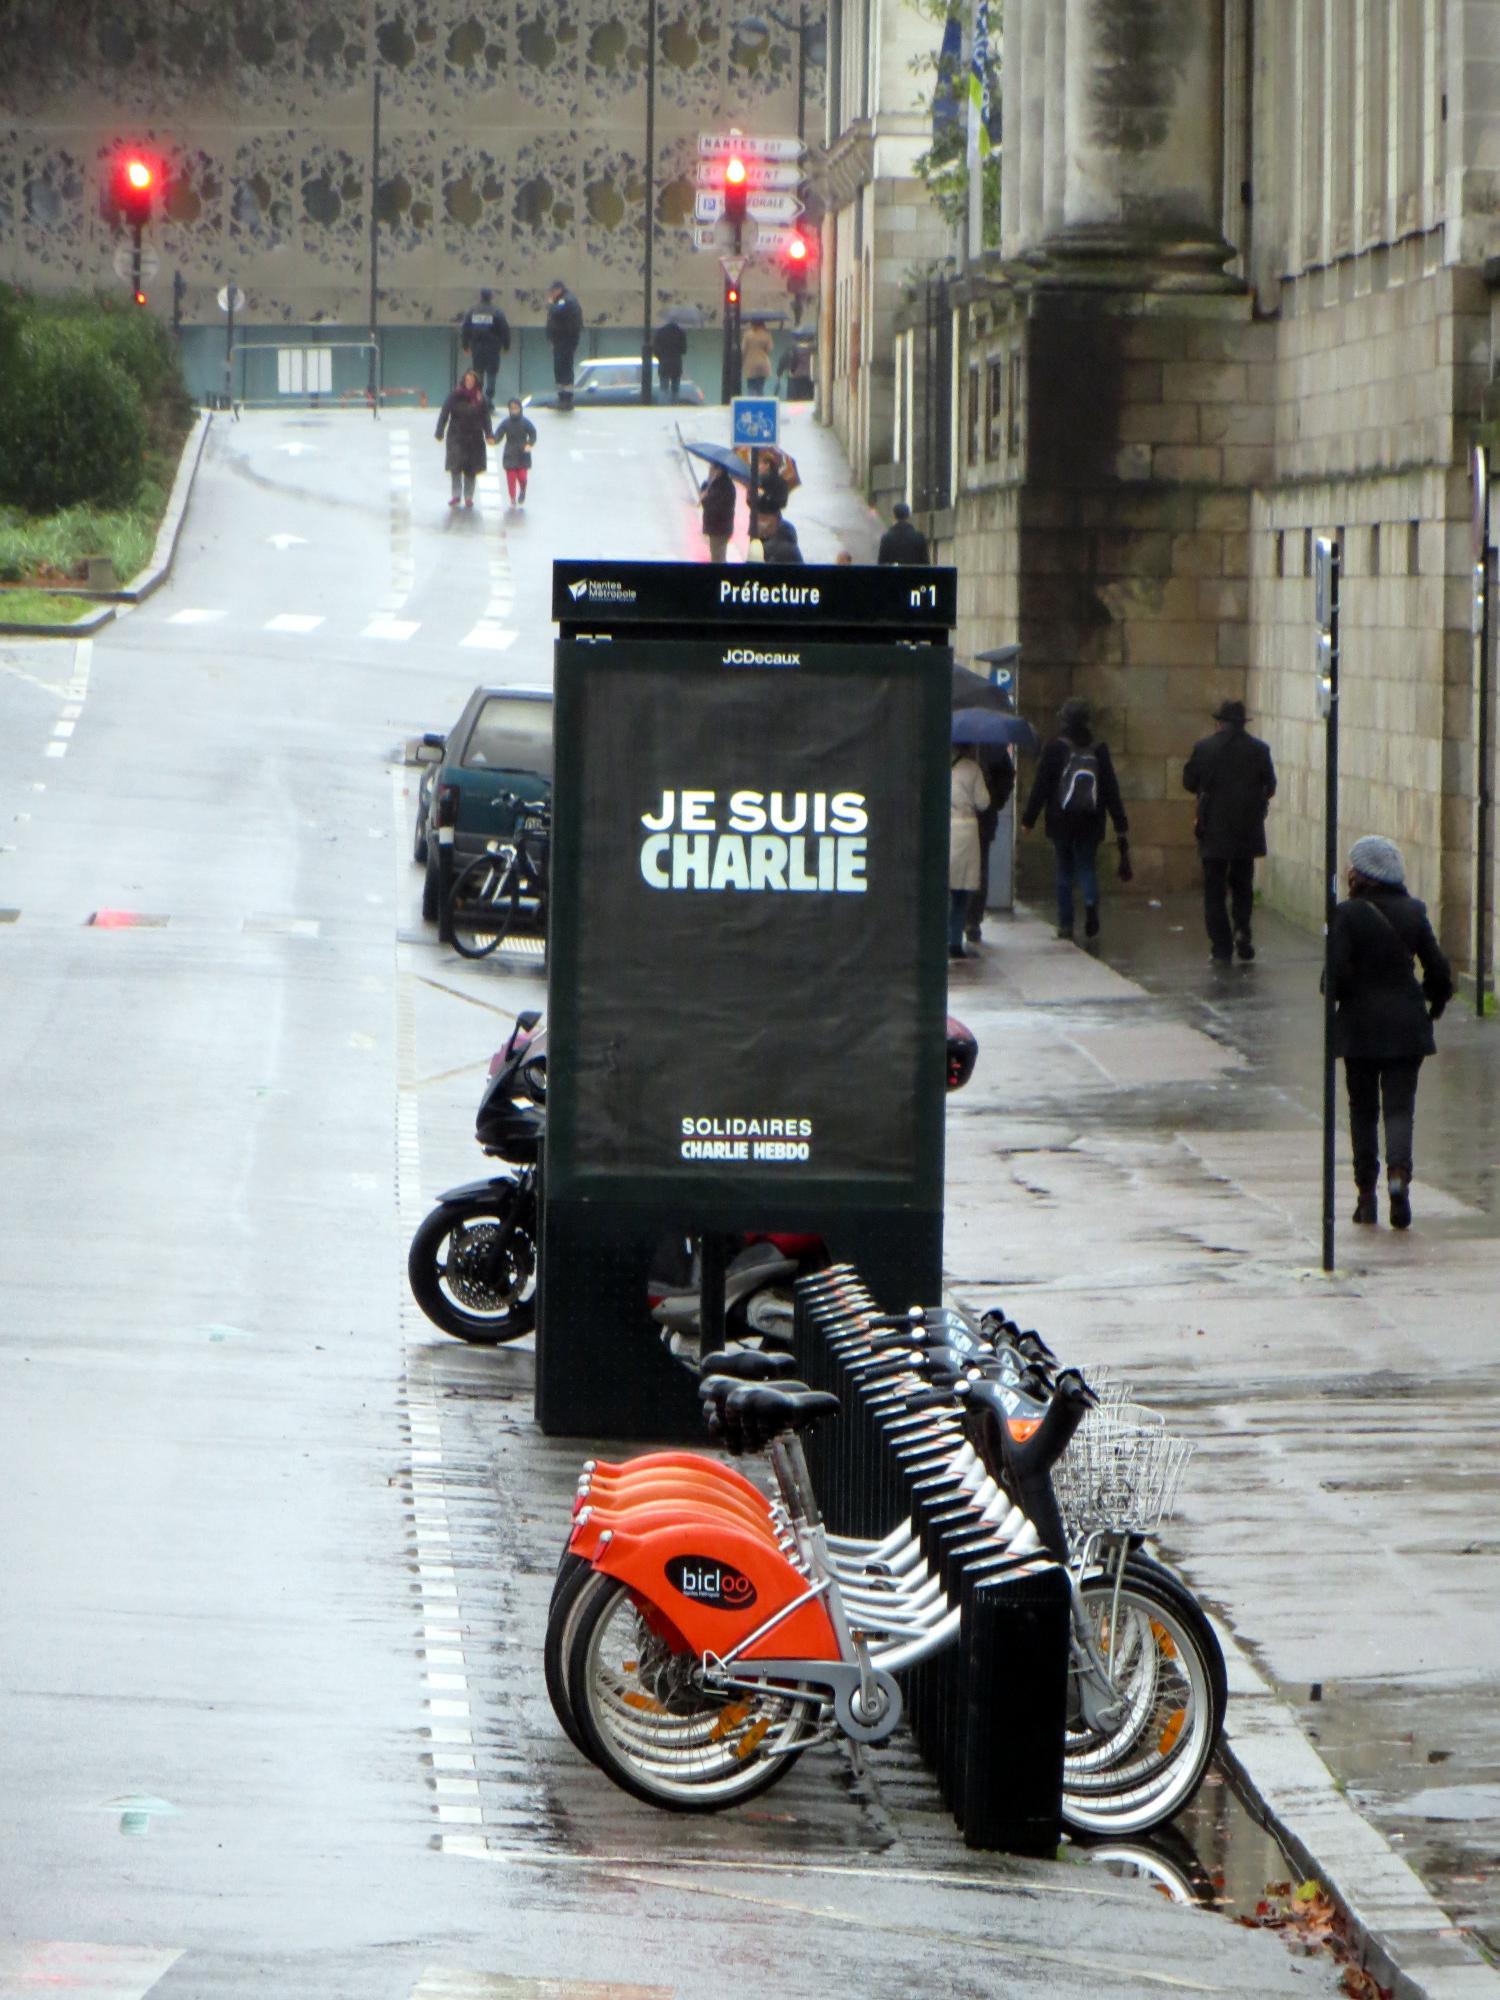 Affiche publicitaire, solidaire Charlie Hebdo